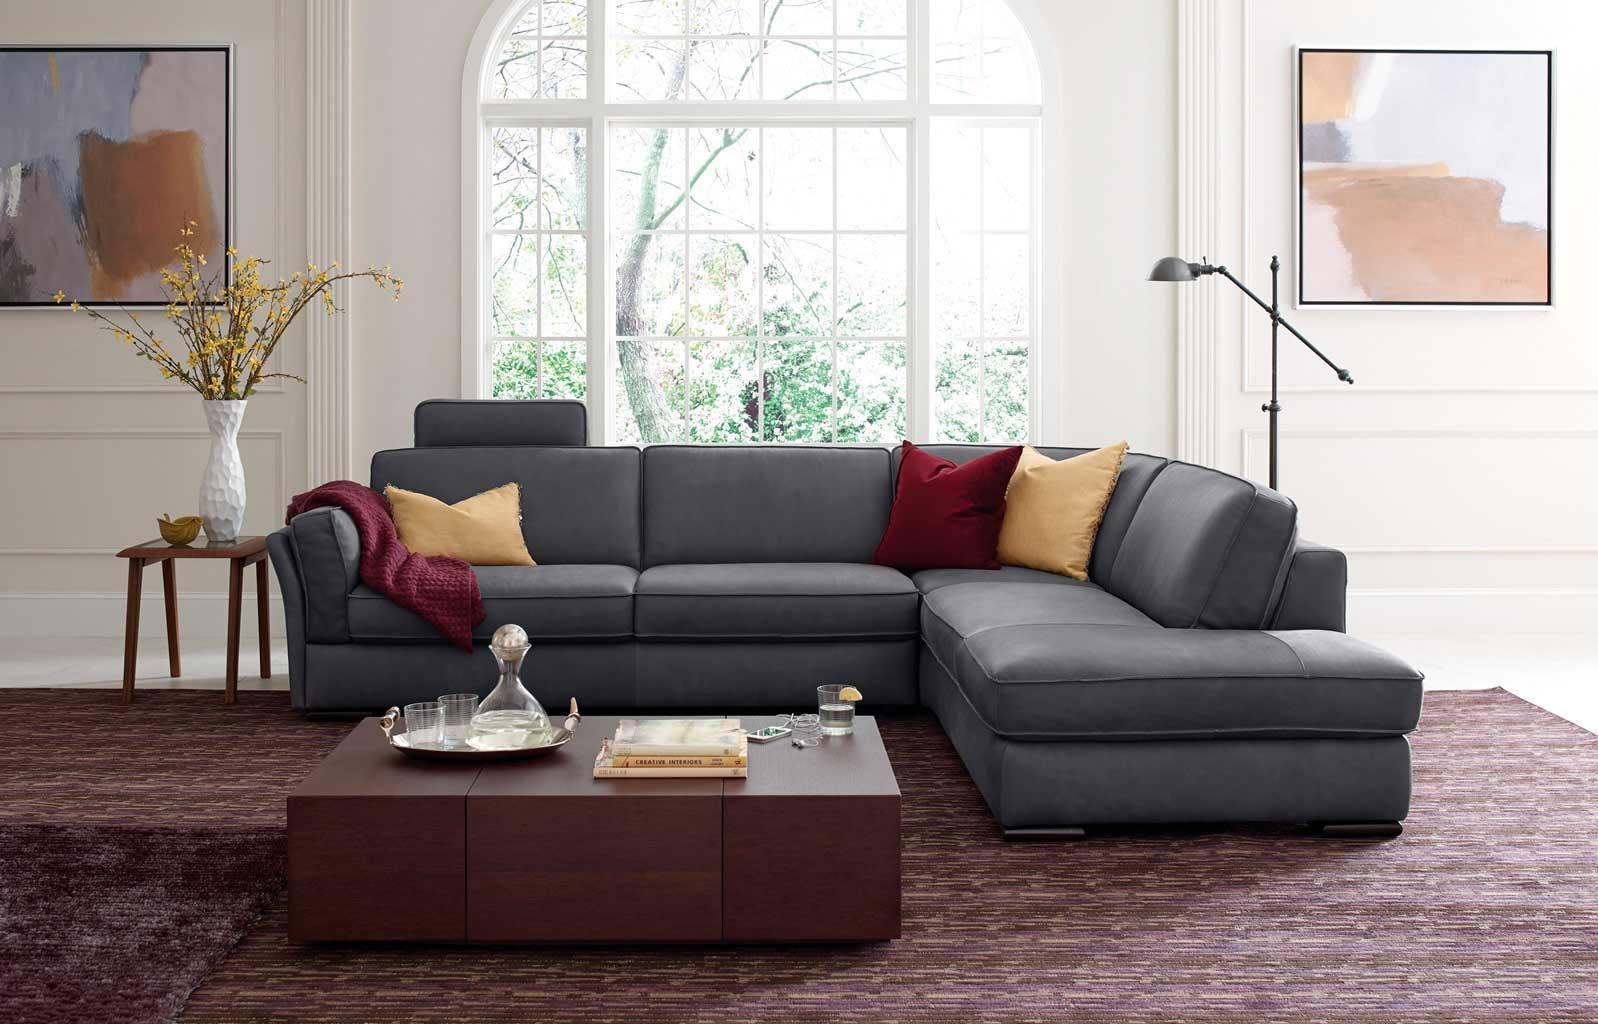 Natuzzi Sectional Sofa | Sofa Gallery | Kengire Within Natuzzi Microfiber Sectional Sofas (Image 14 of 20)